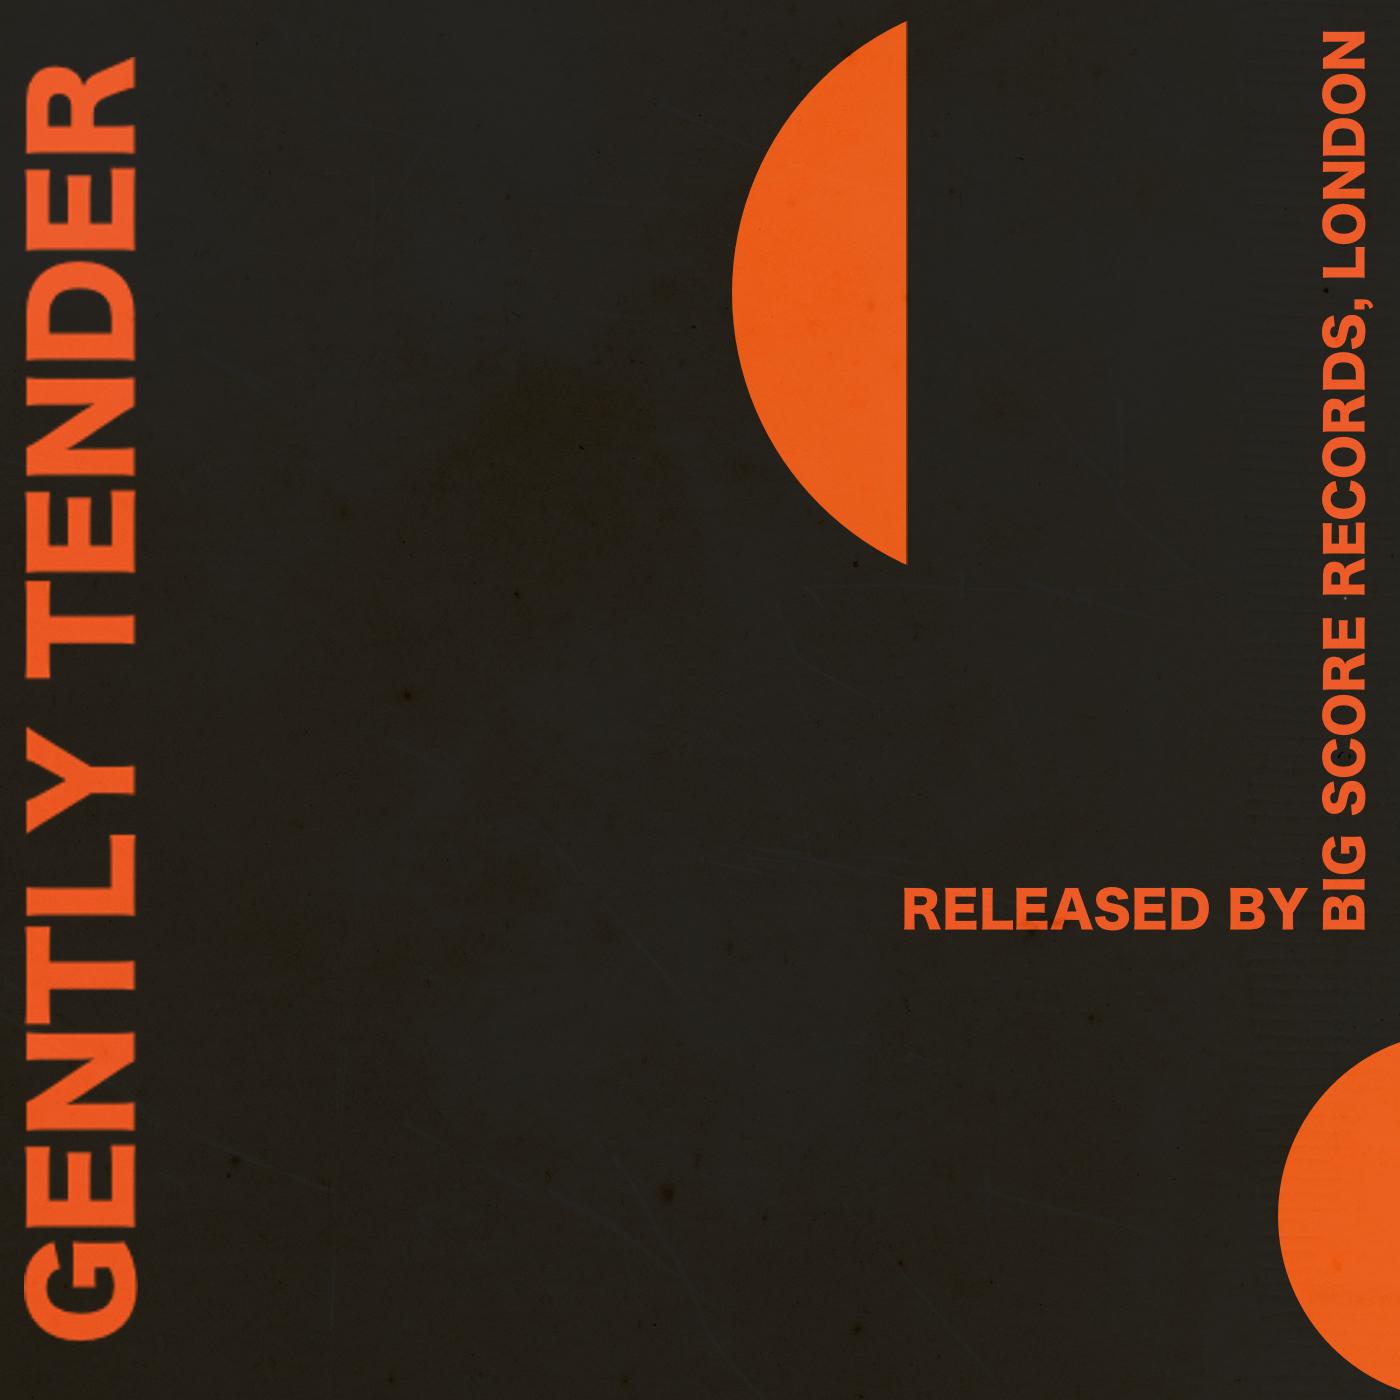 BSR007 - GENTLY TENDER - 2 CHORDS GOOD / AVEZ-VOUS DÉJÀ